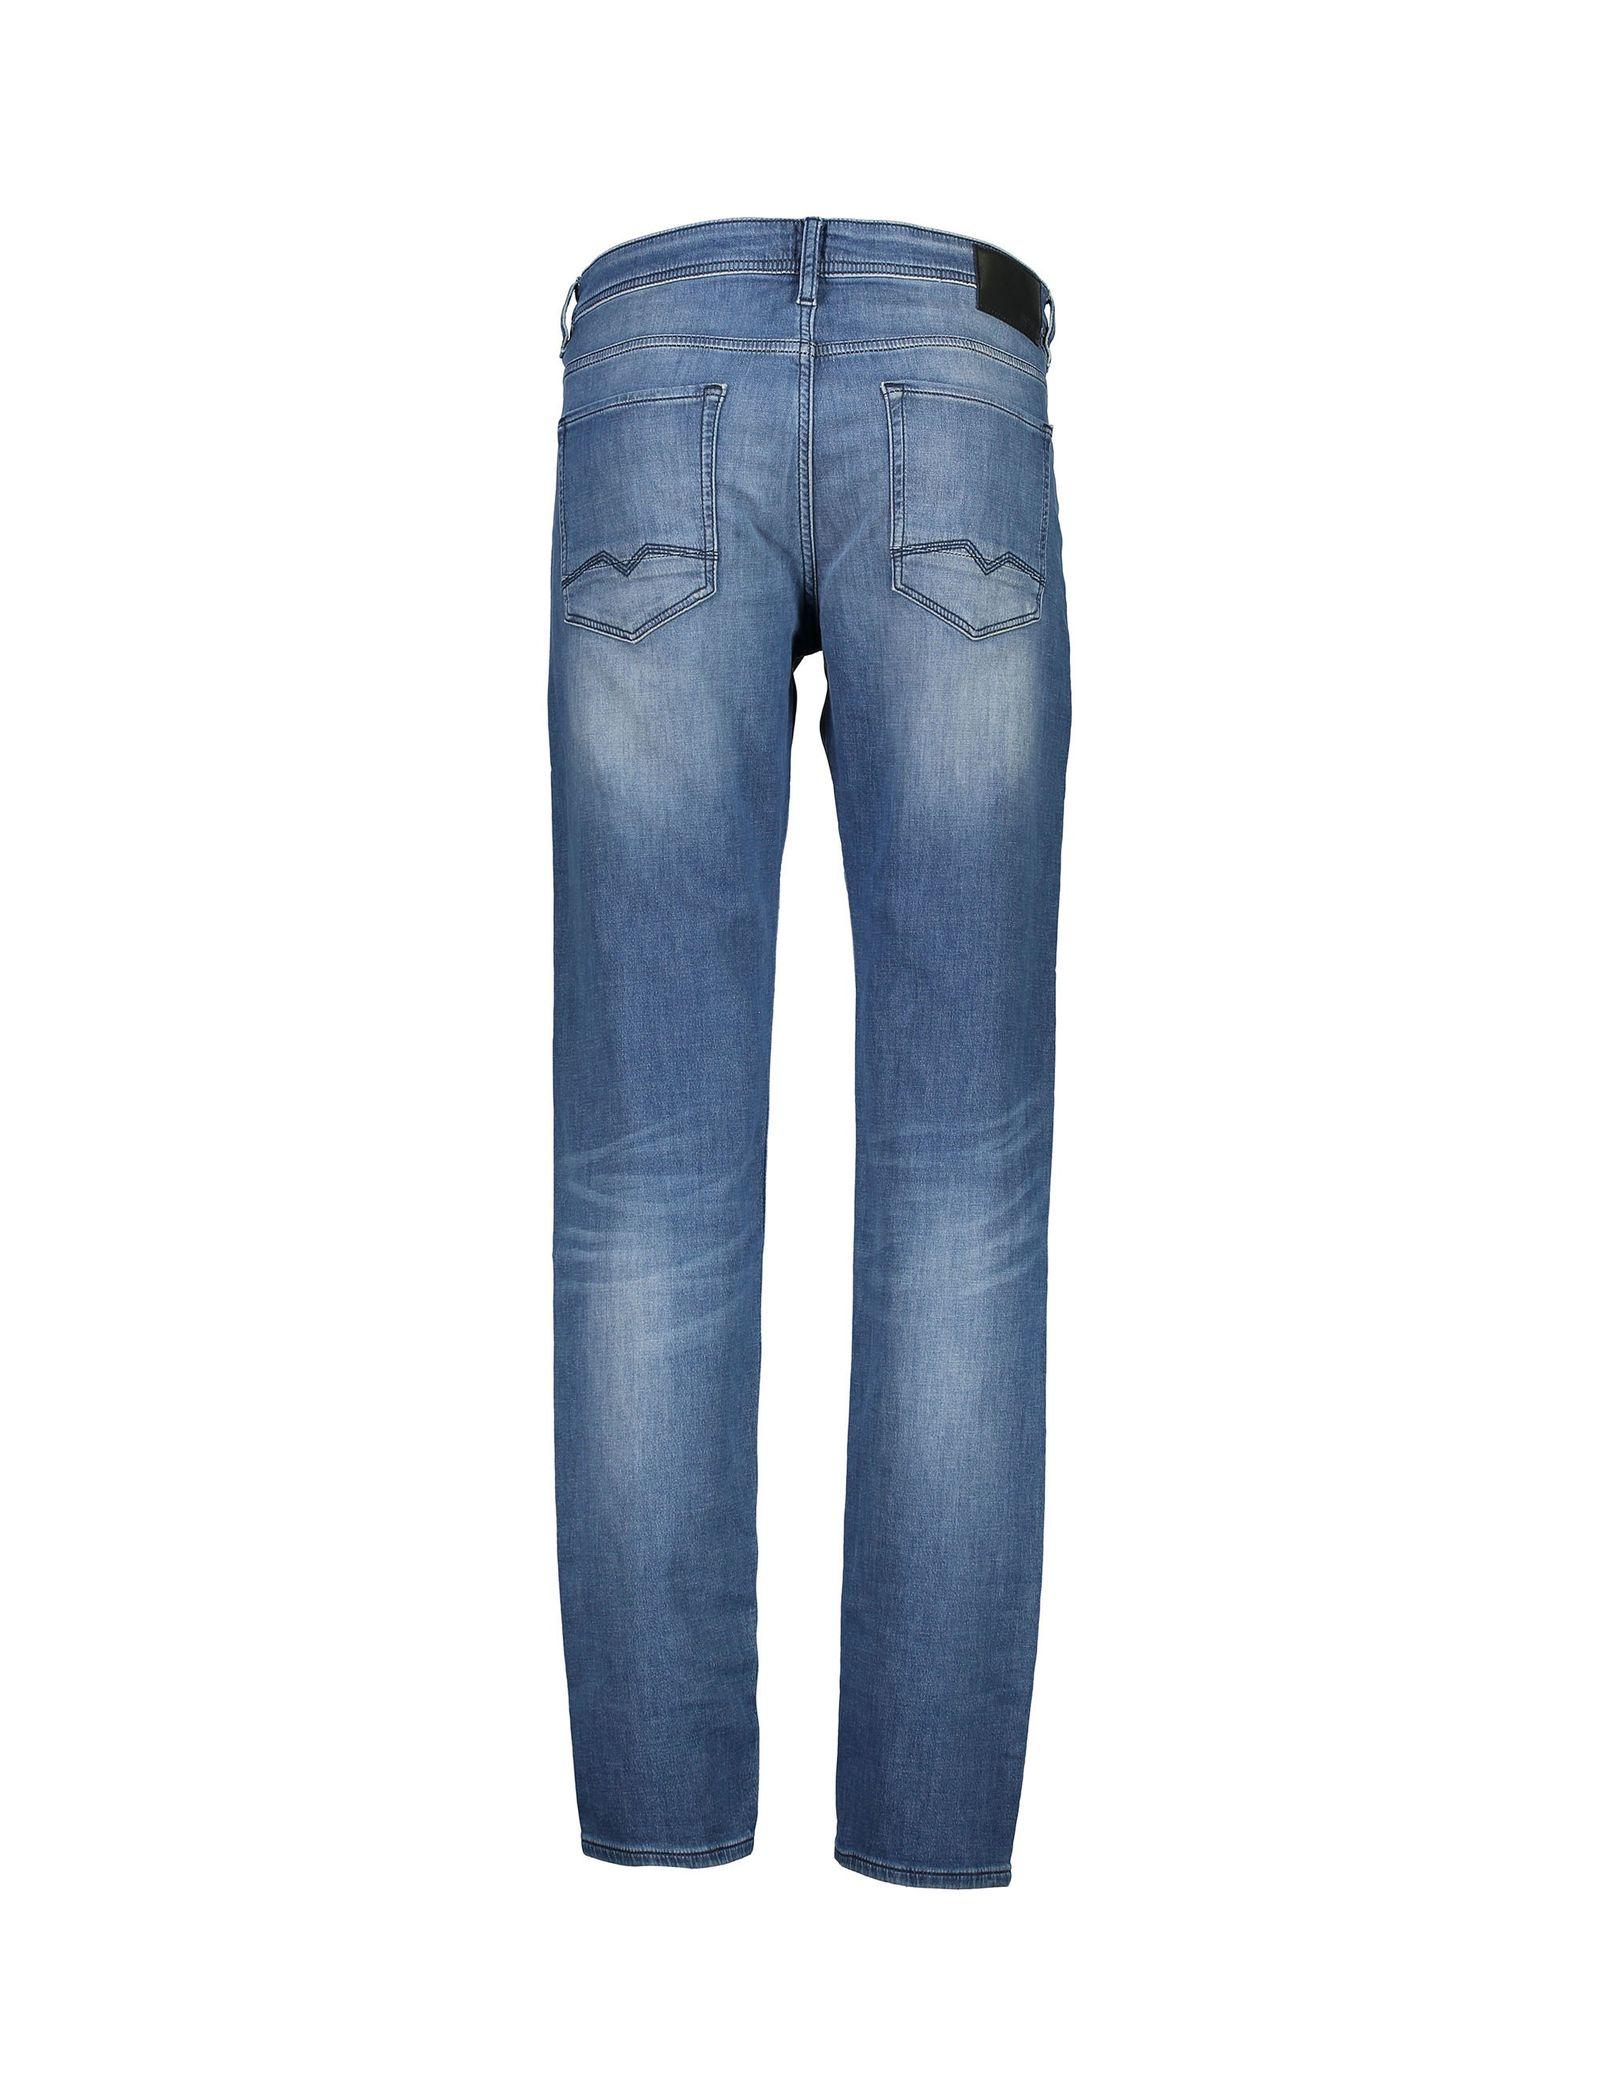 شلوار جین راسته مردانه Orange90-P SUAVE - باس اورنج - آبي تيره - 3